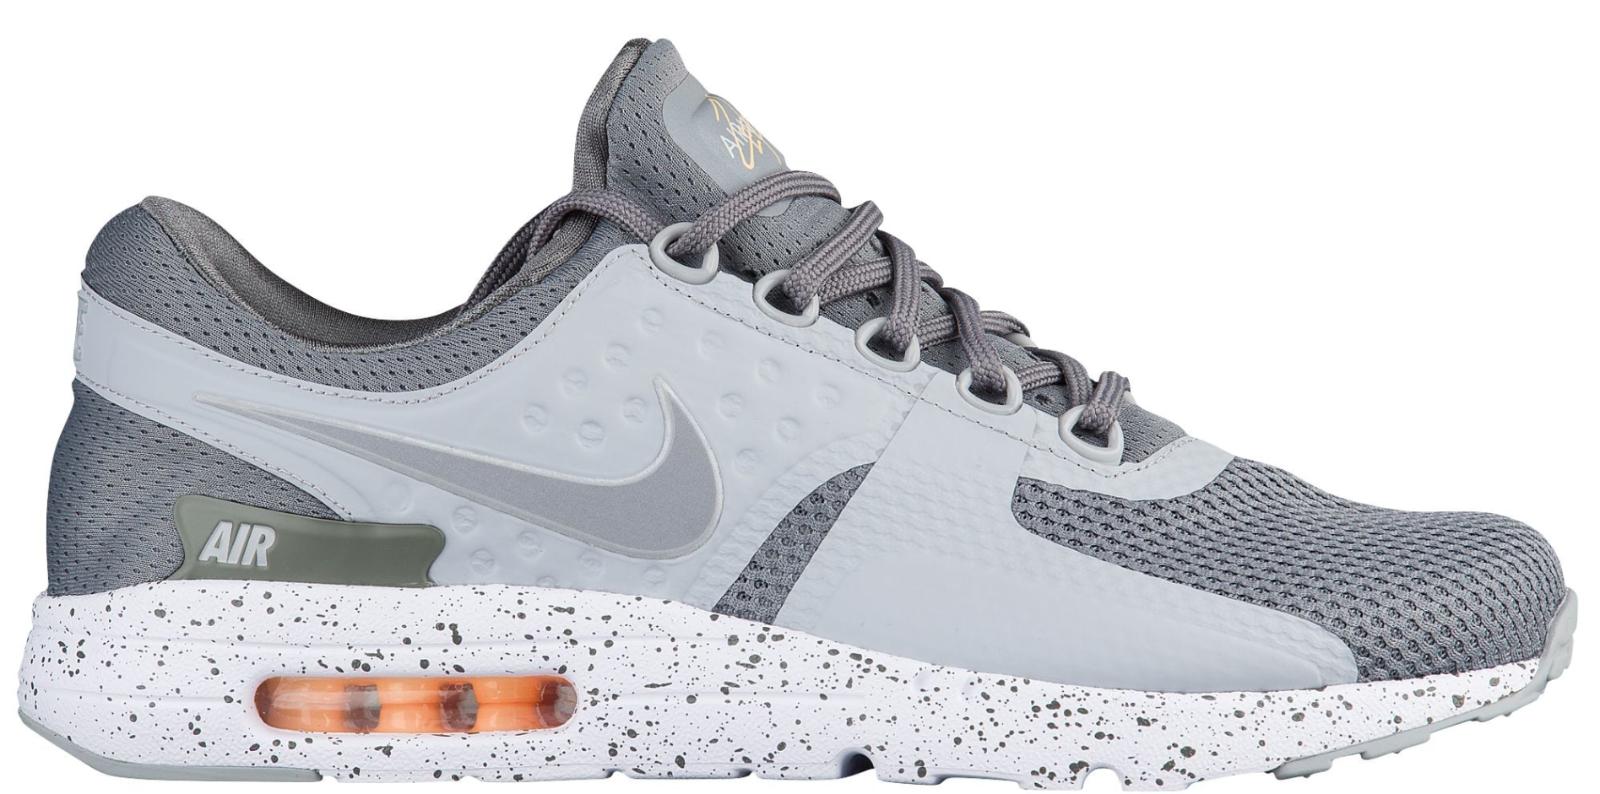 NEW Men's Nike Air Max Zero Premium Shoes Sneakers Size: 6 Color: Gray